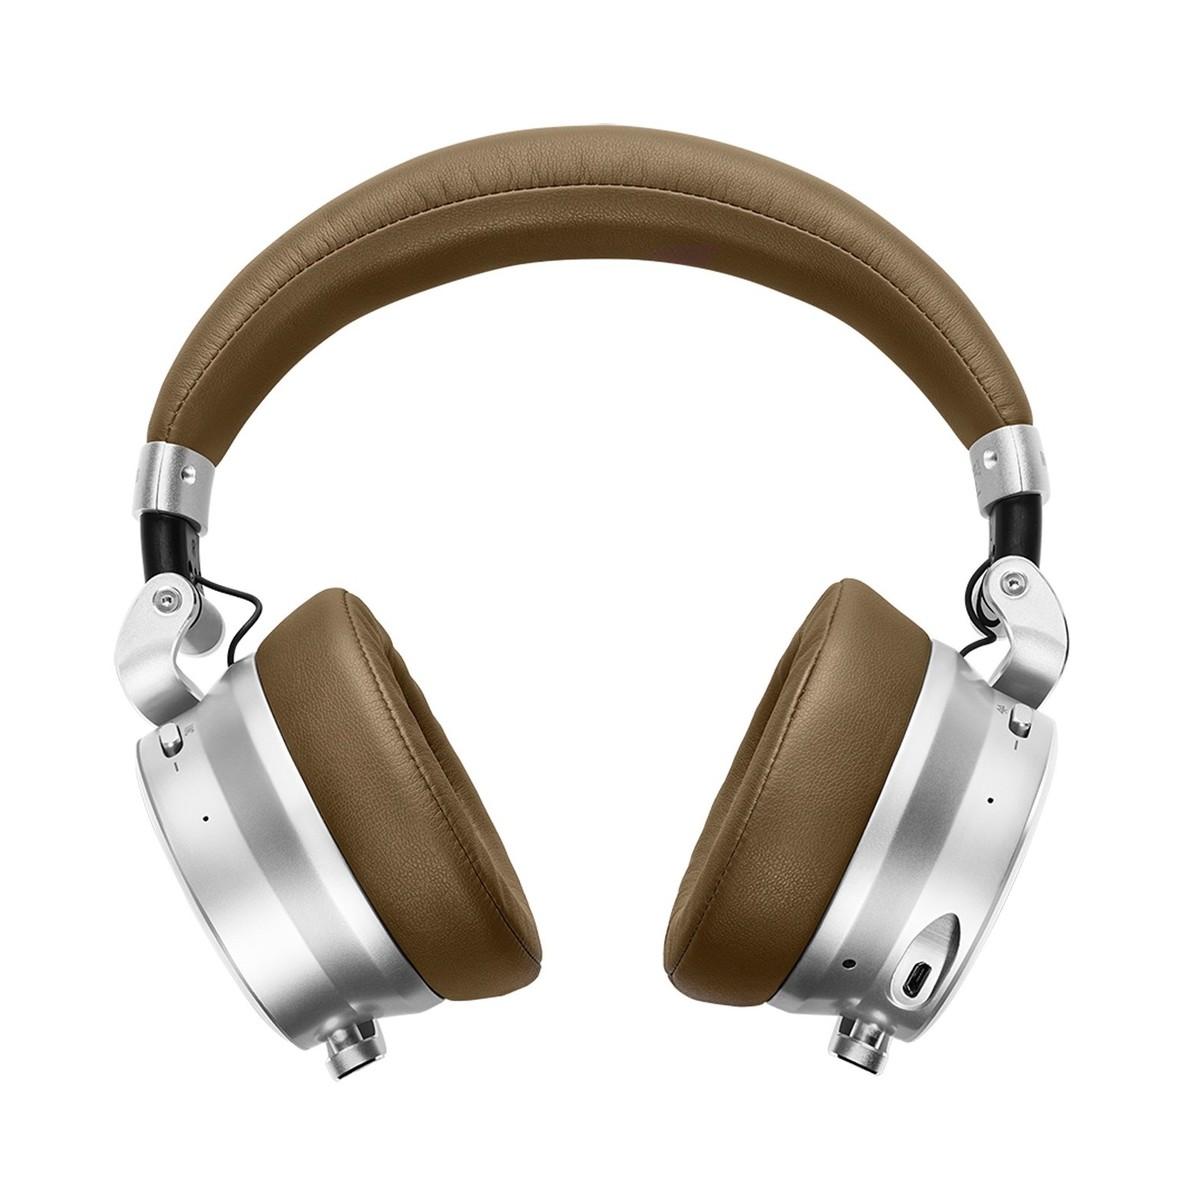 8b675d57cc4 ... Meter OV-1-B Bluetooth Over Ear Headphones, Tan - Front ...